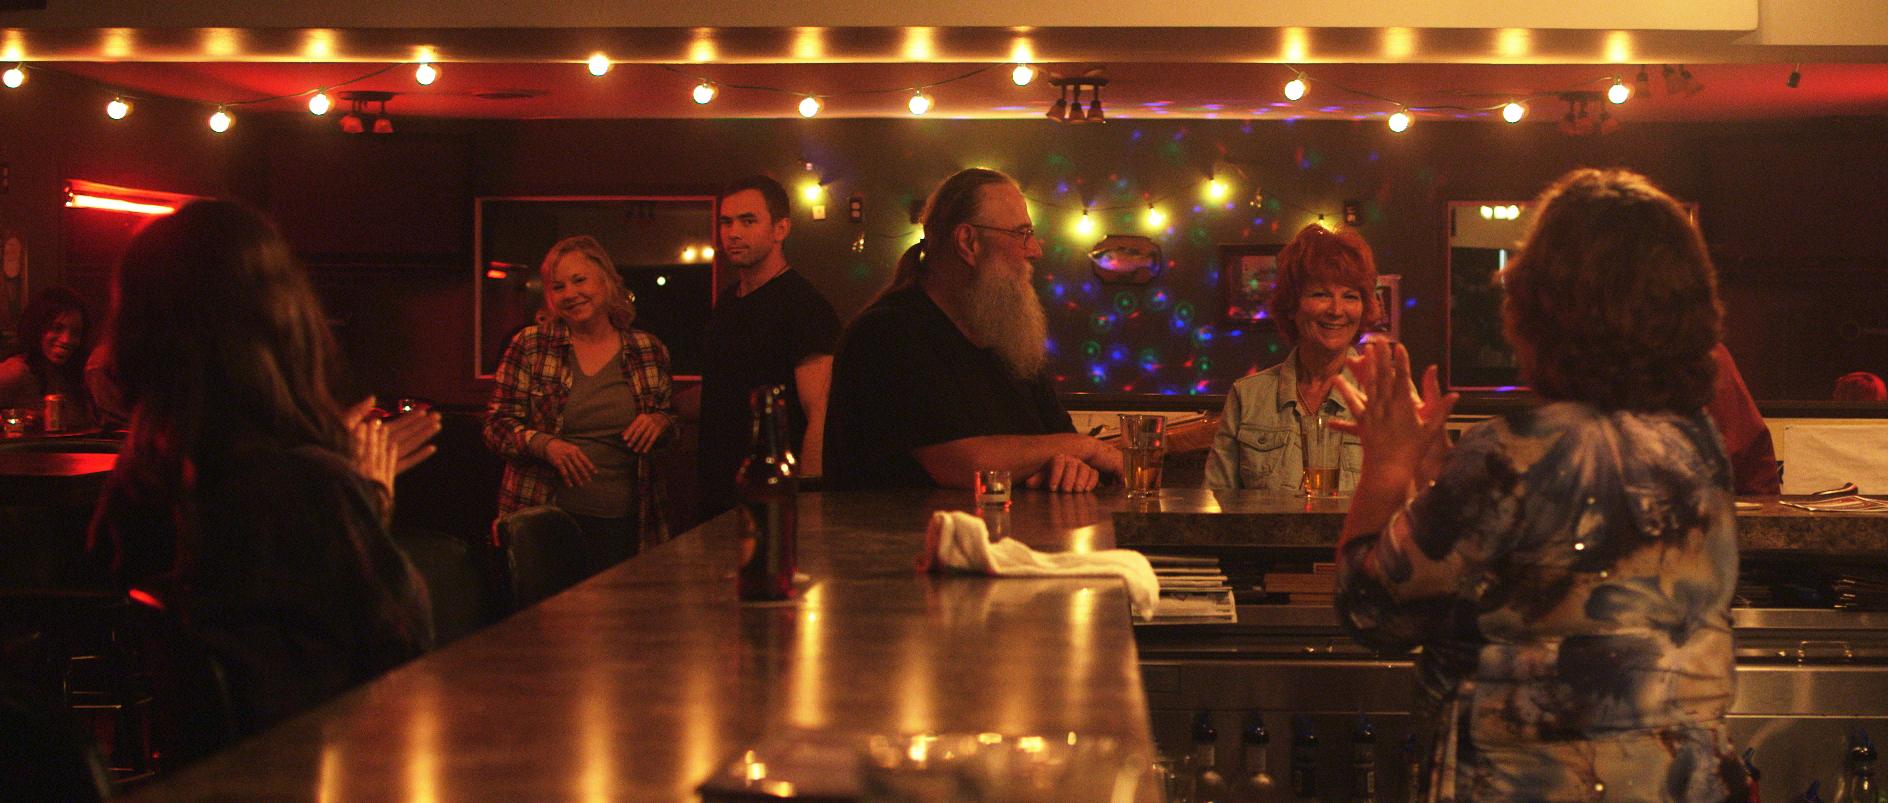 536 Vic happy family bar.png